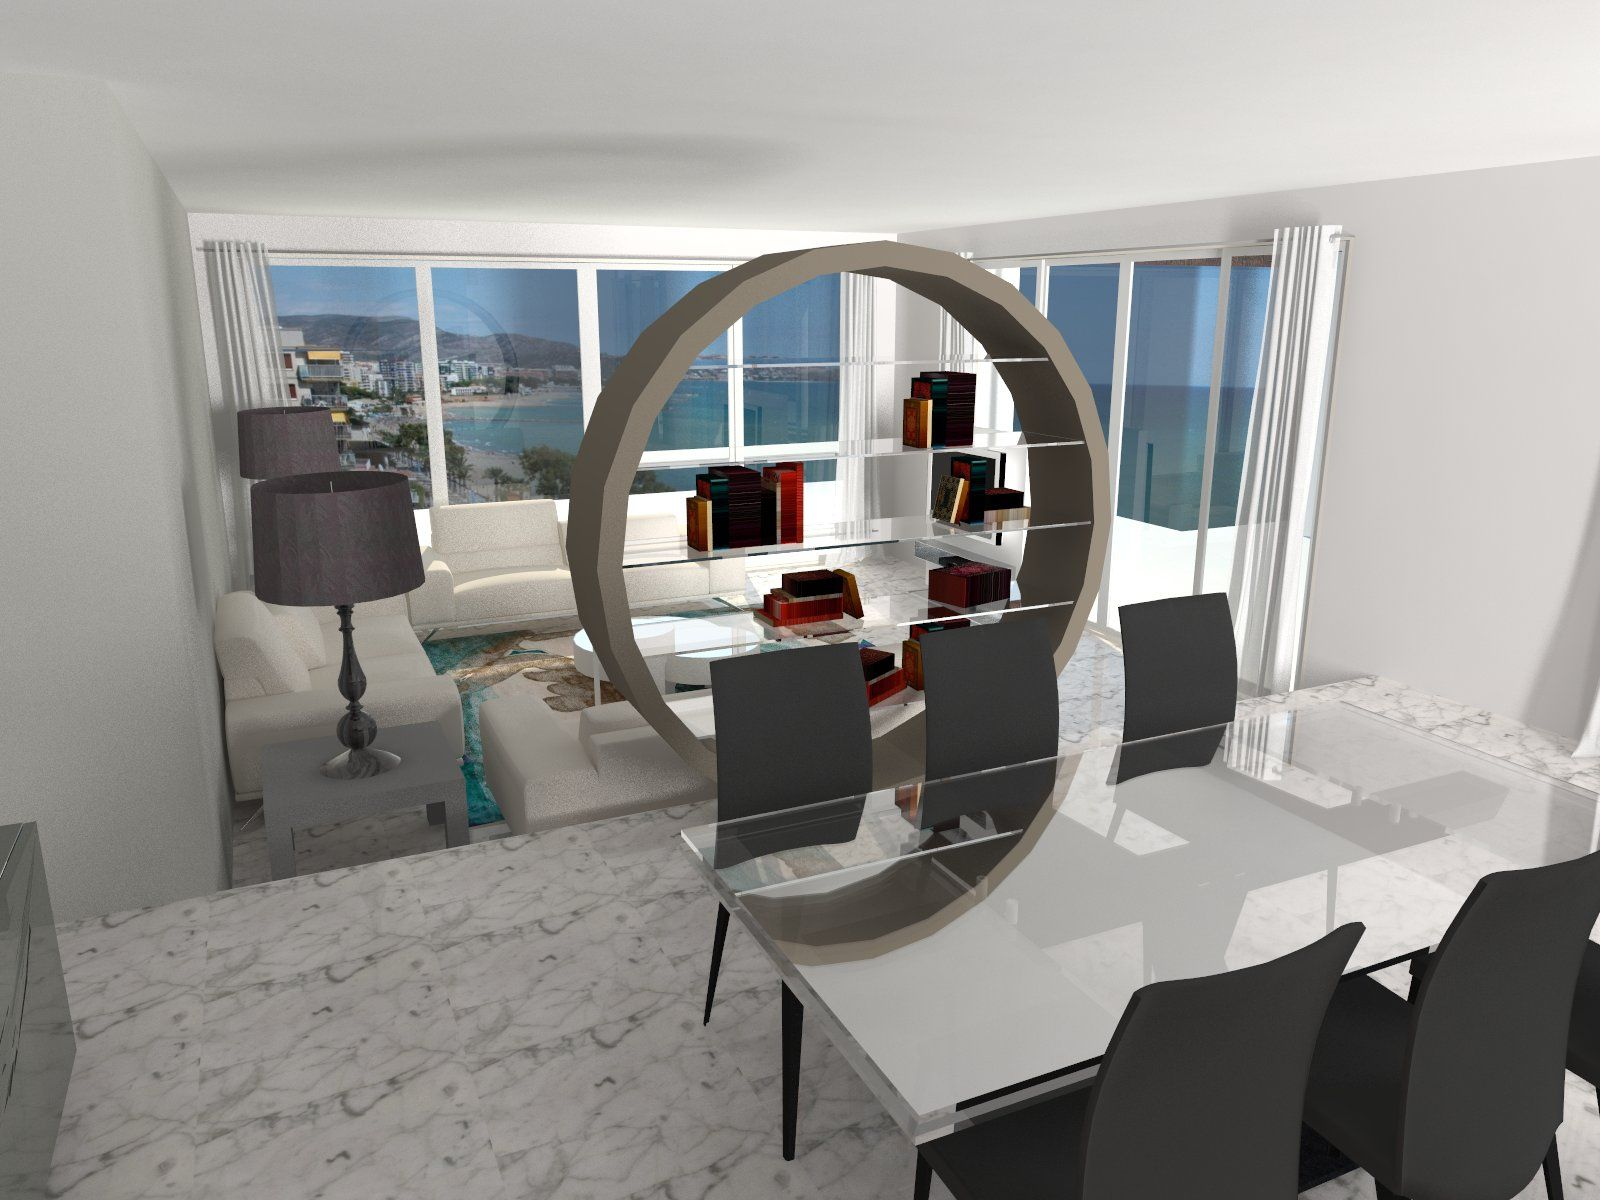 biblioteca omega mesa axel sillas longitude d coration pinterest decoration. Black Bedroom Furniture Sets. Home Design Ideas